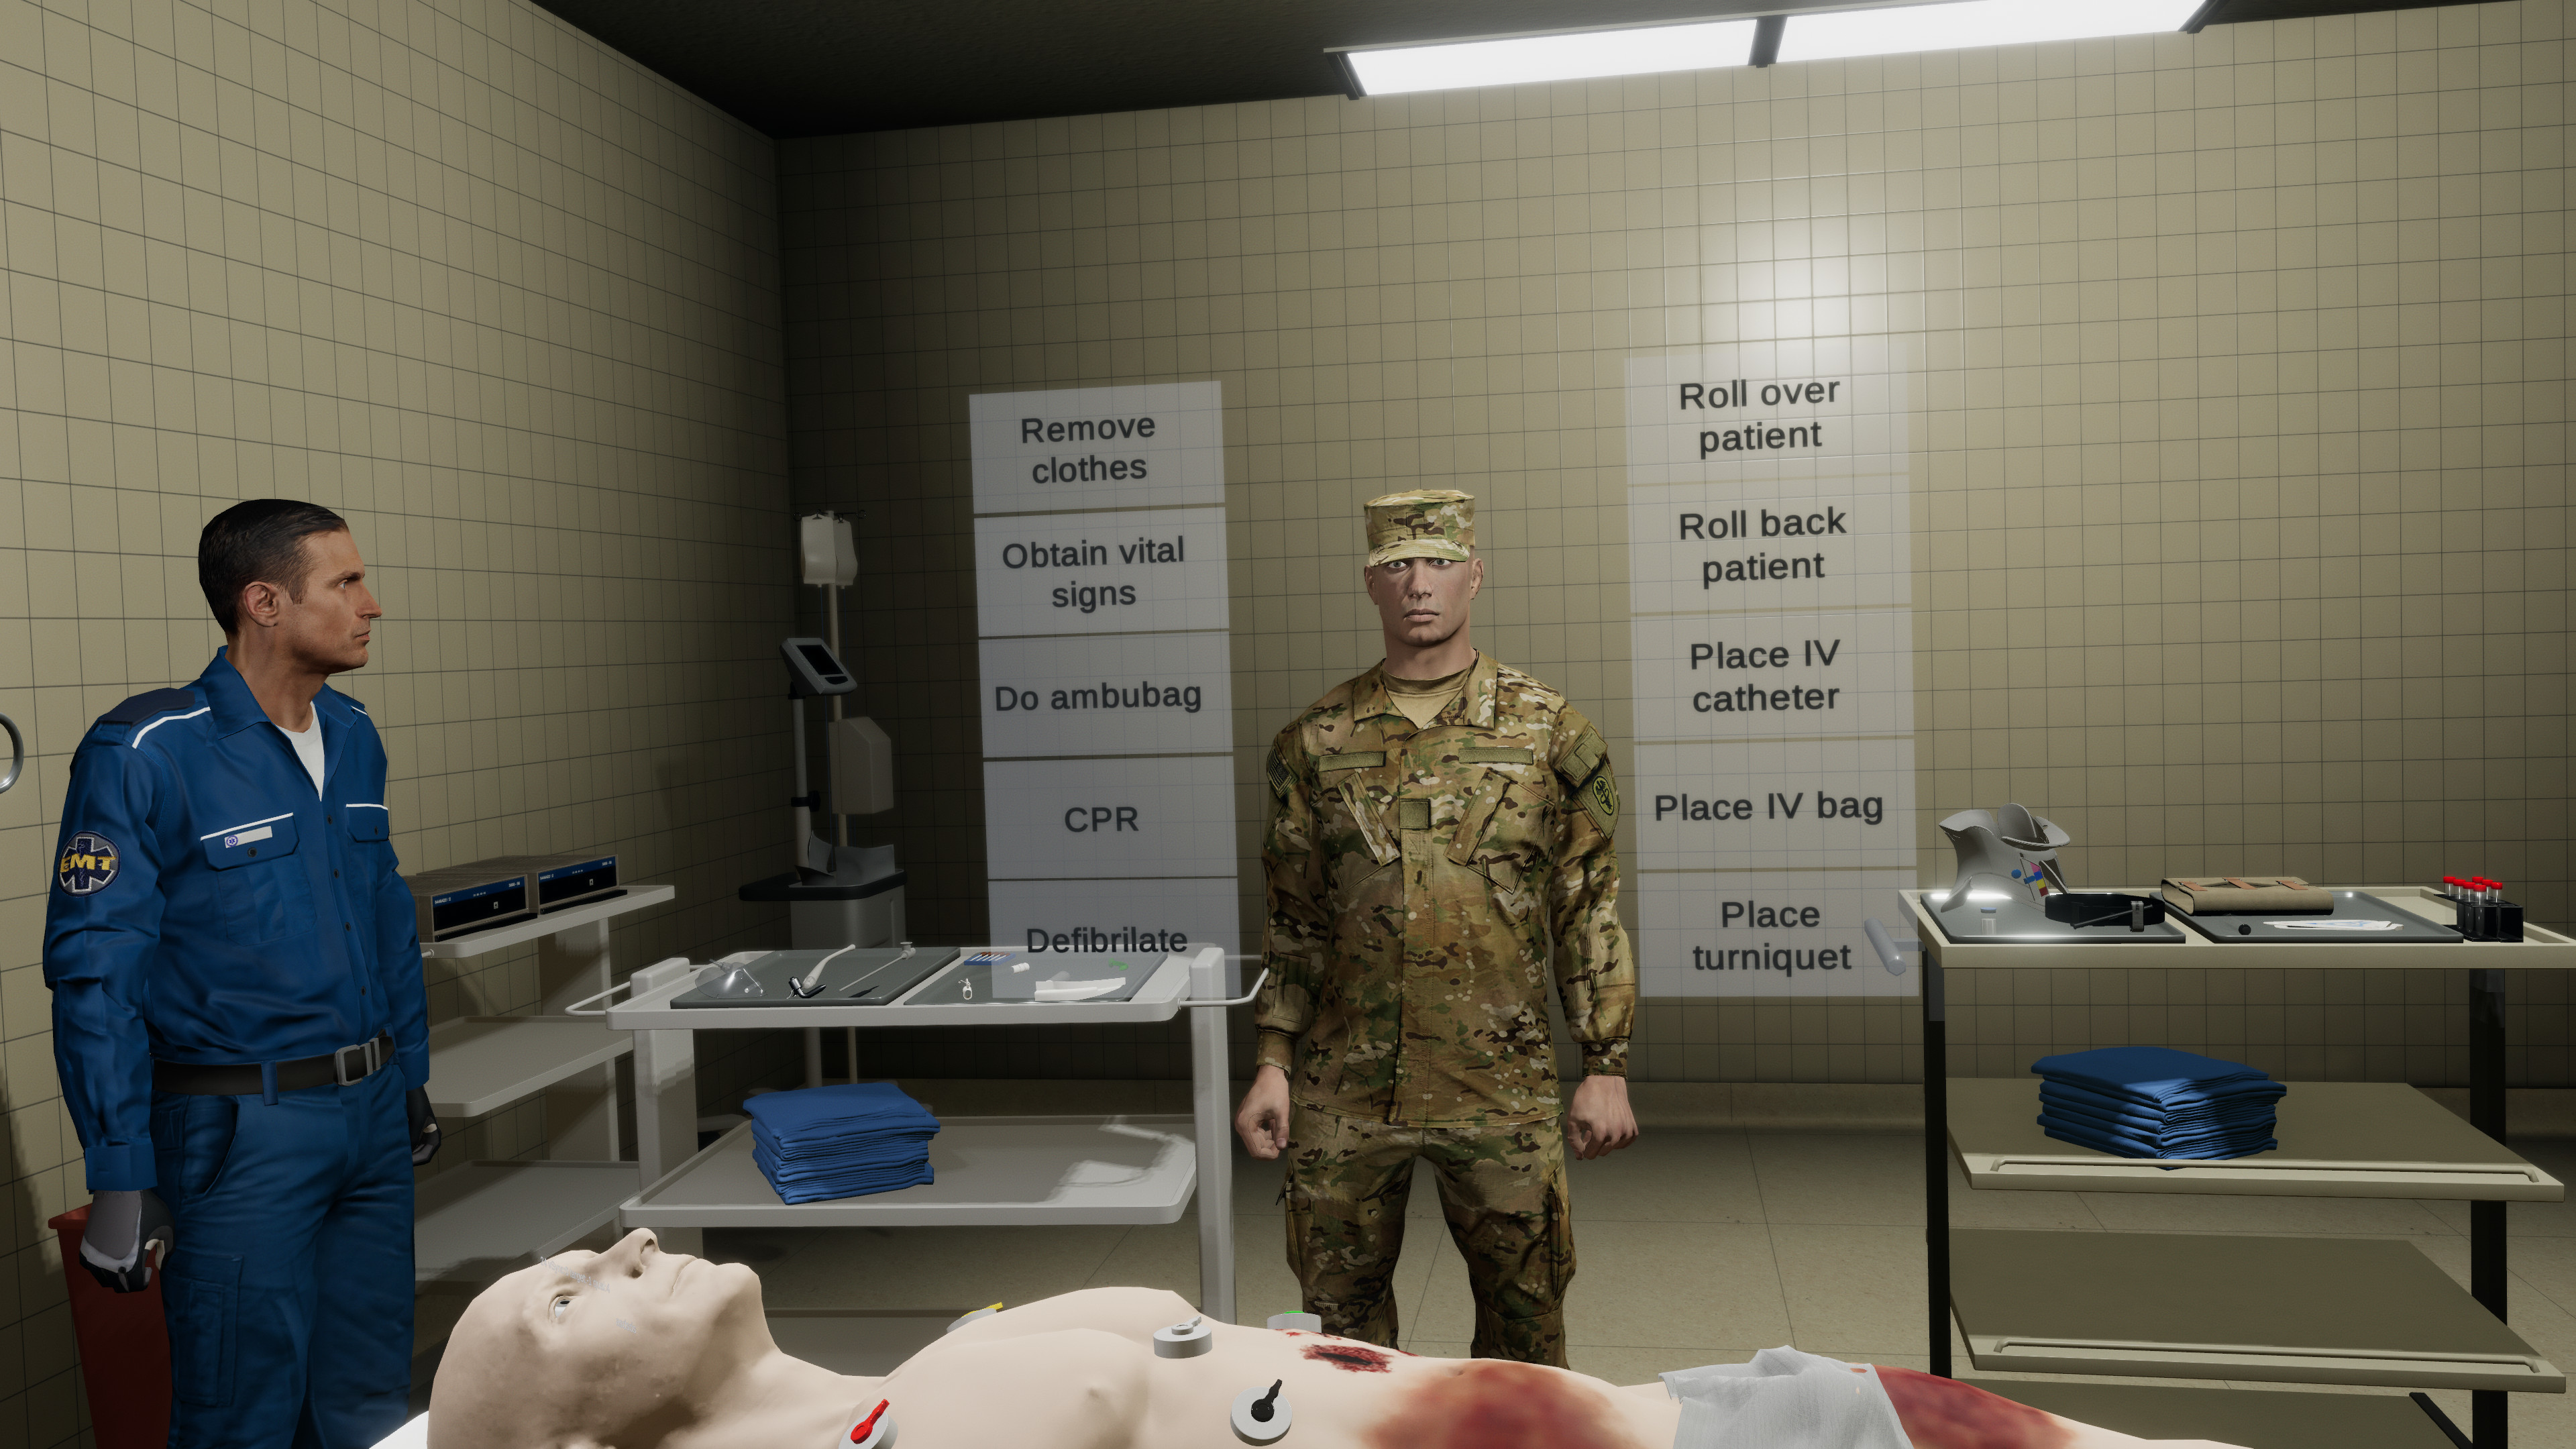 Trauma Simulator - Emergency Room screenshot